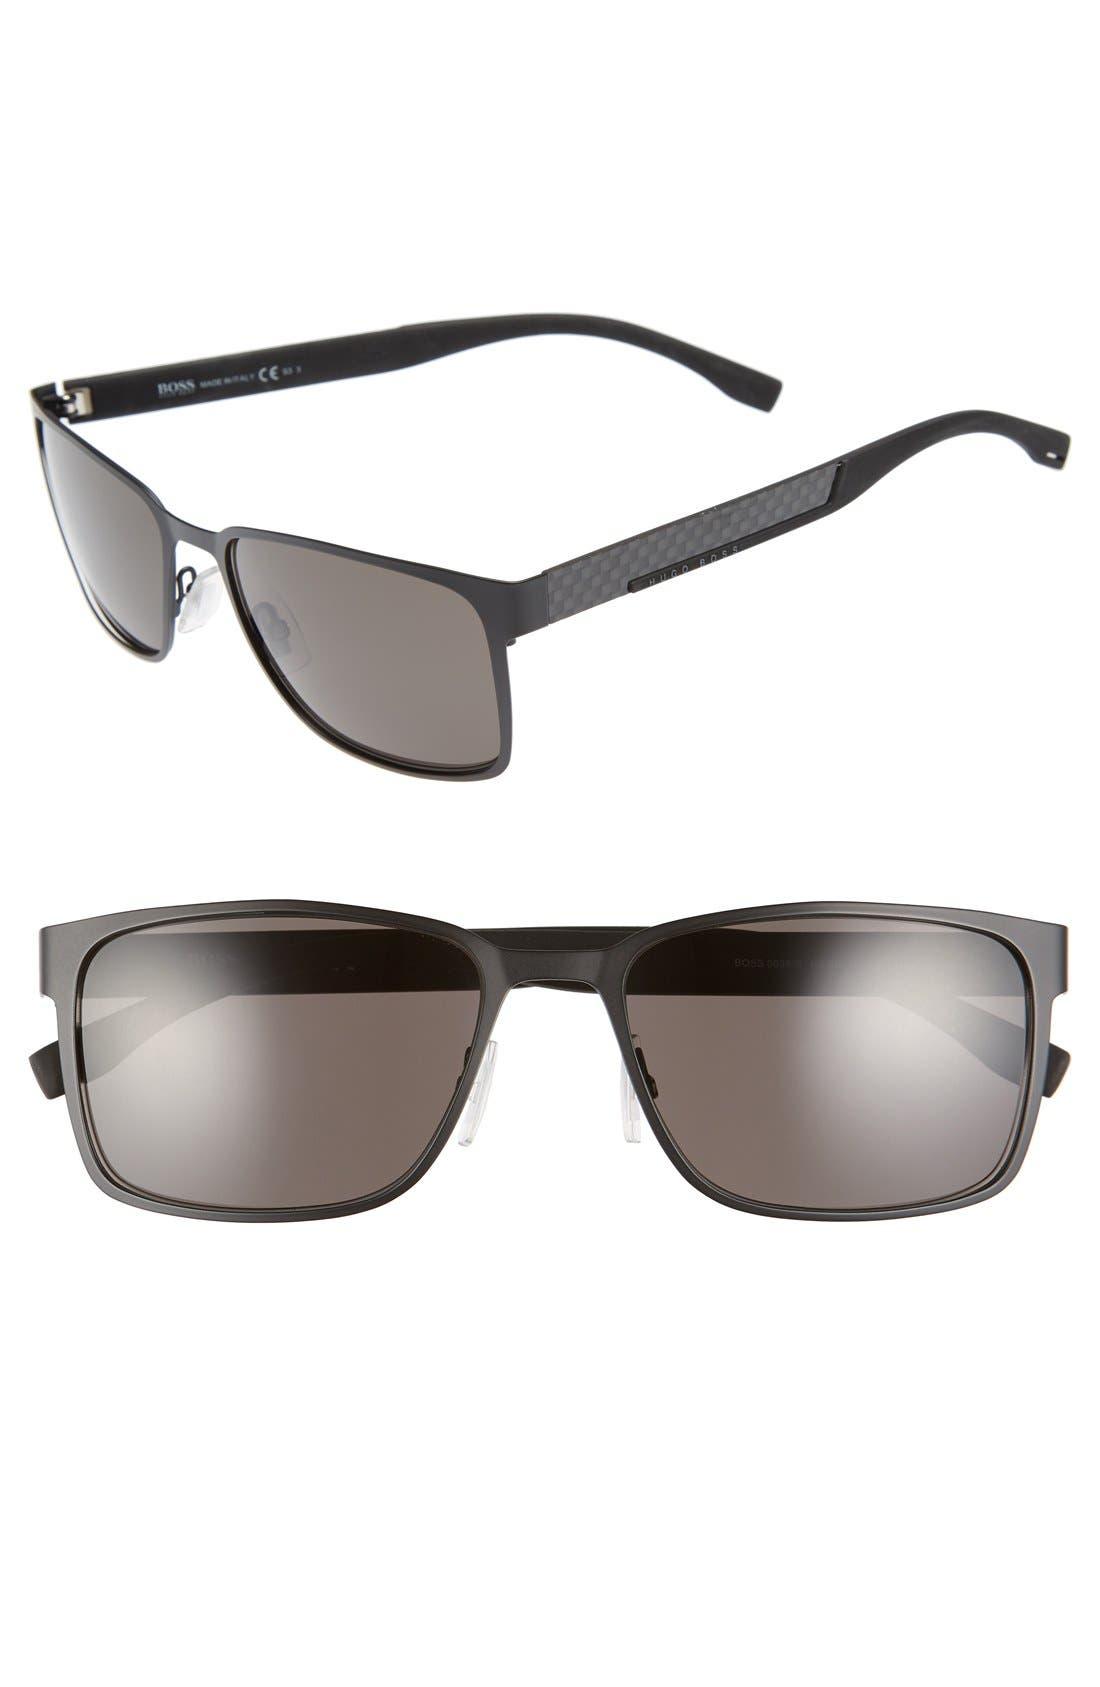 Main Image - BOSS '0638/S' 58mm Sunglasses